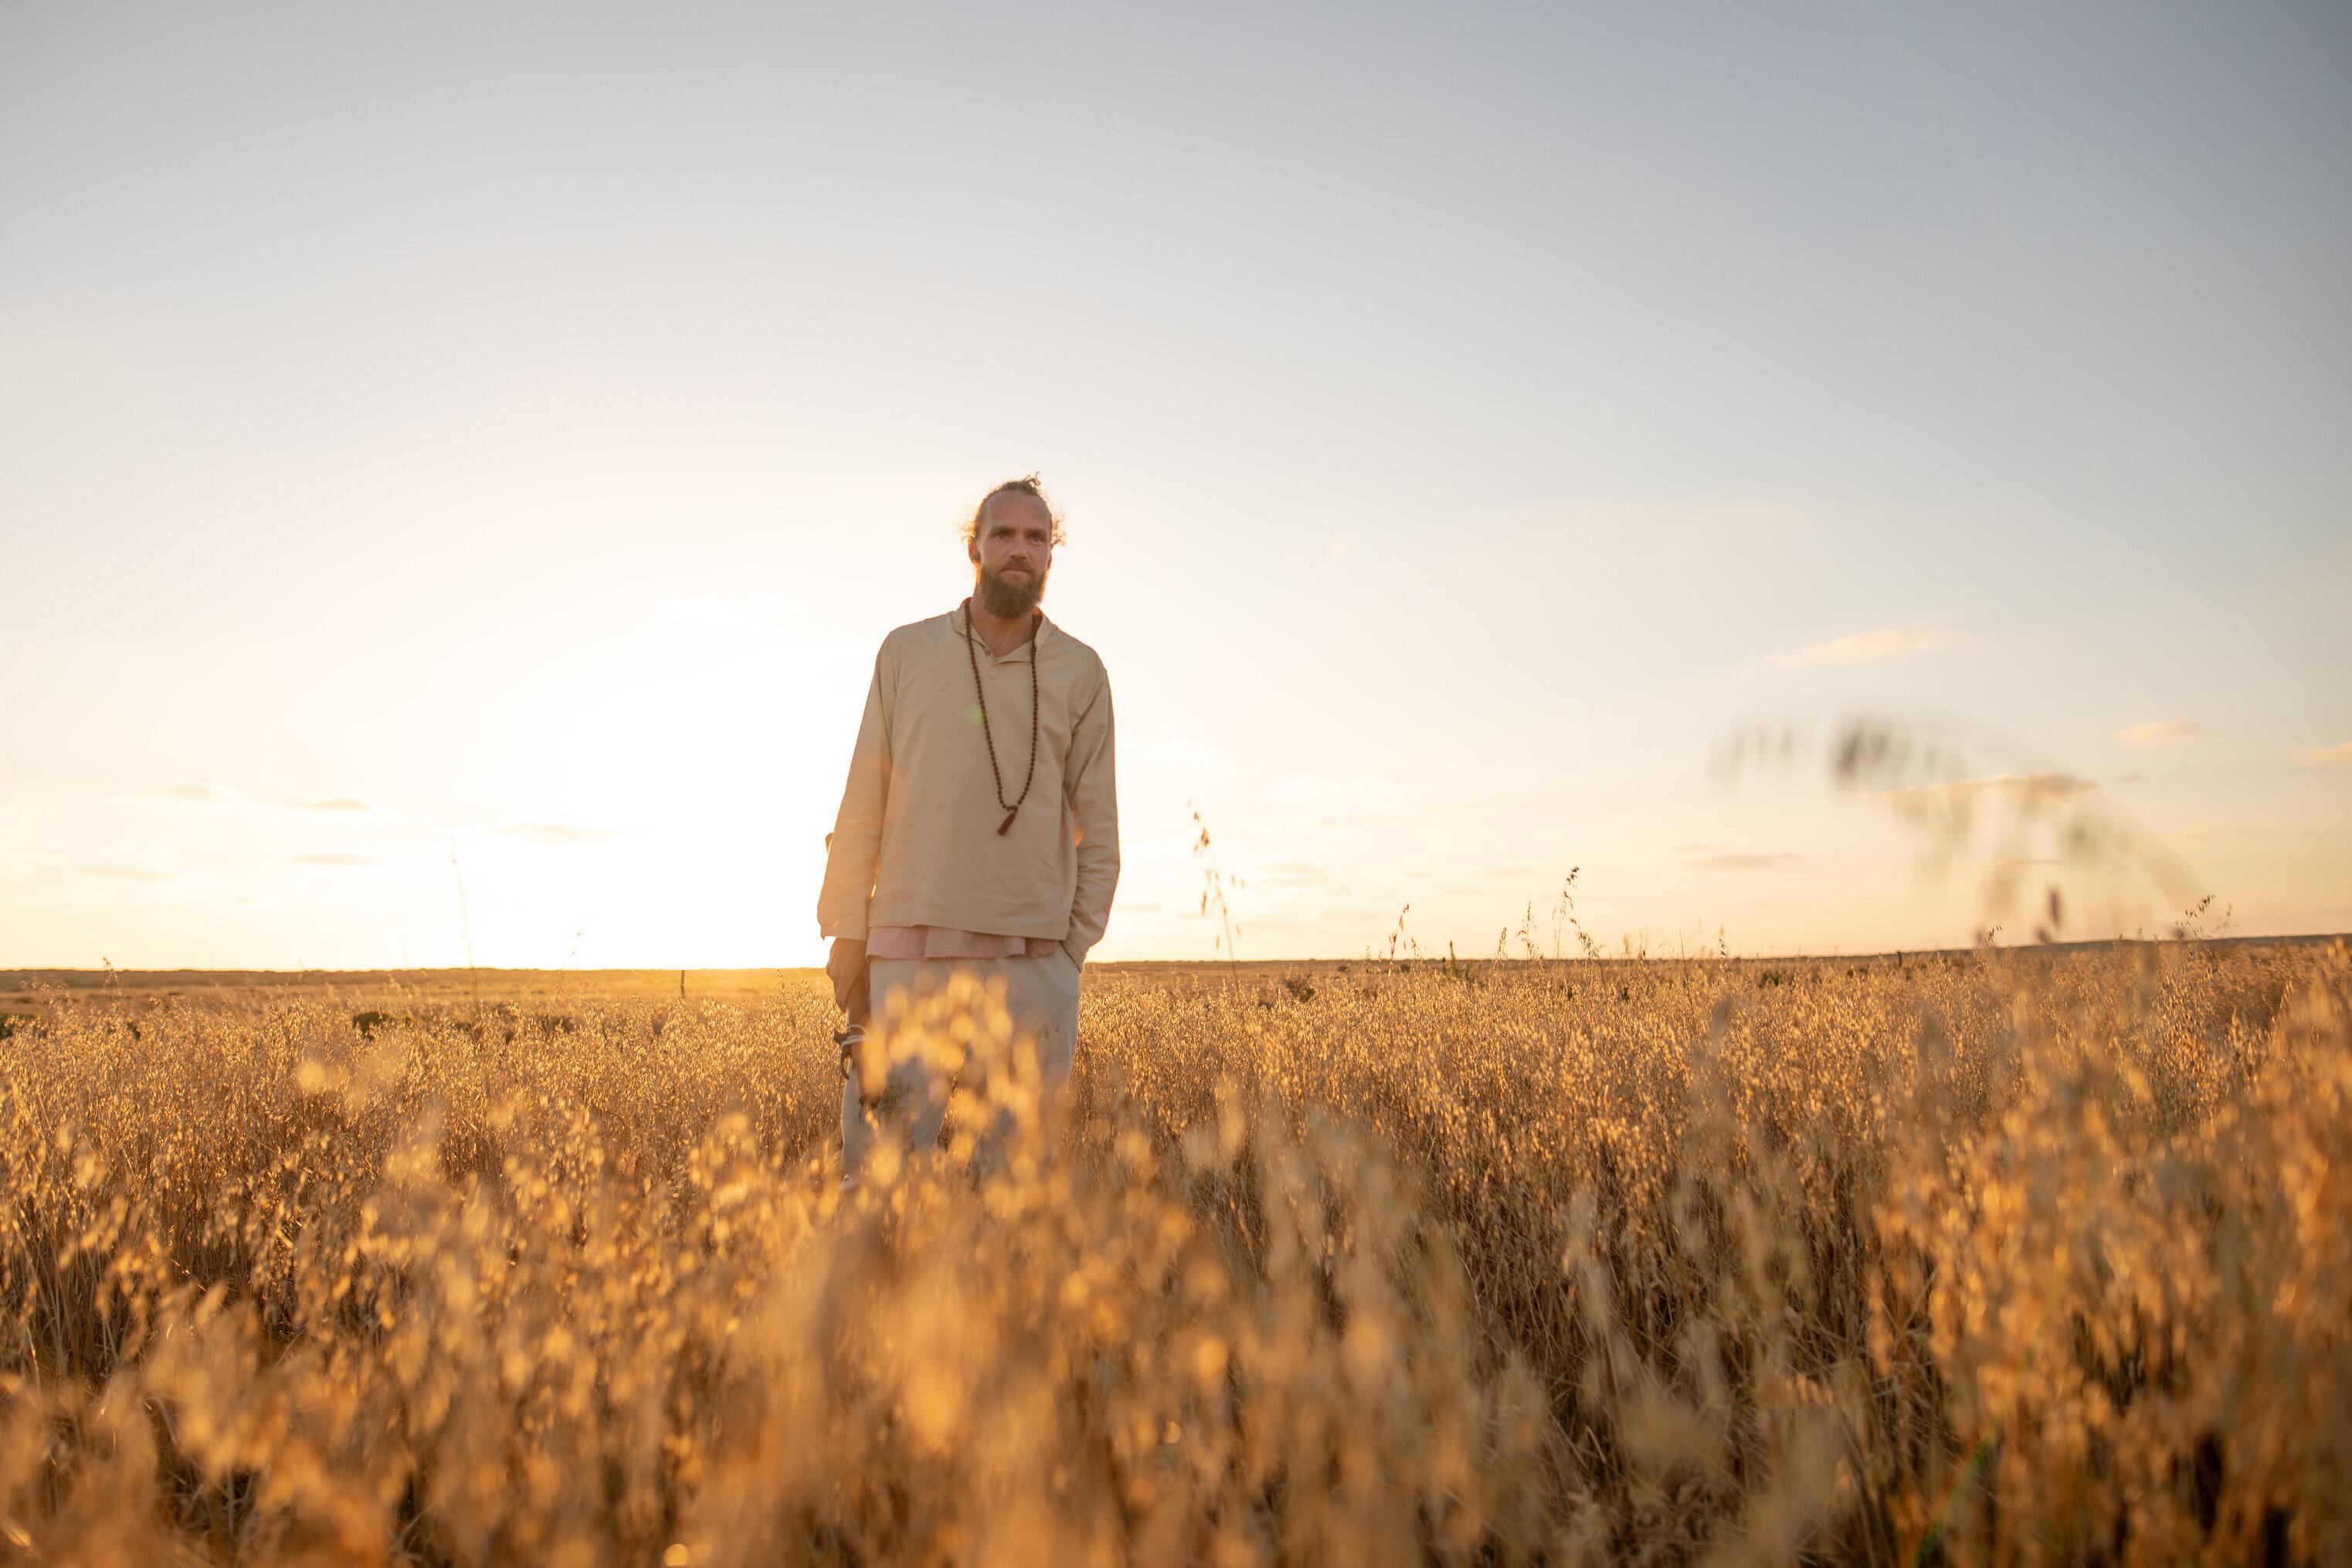 instructor freeing himself from addiction through breathwork